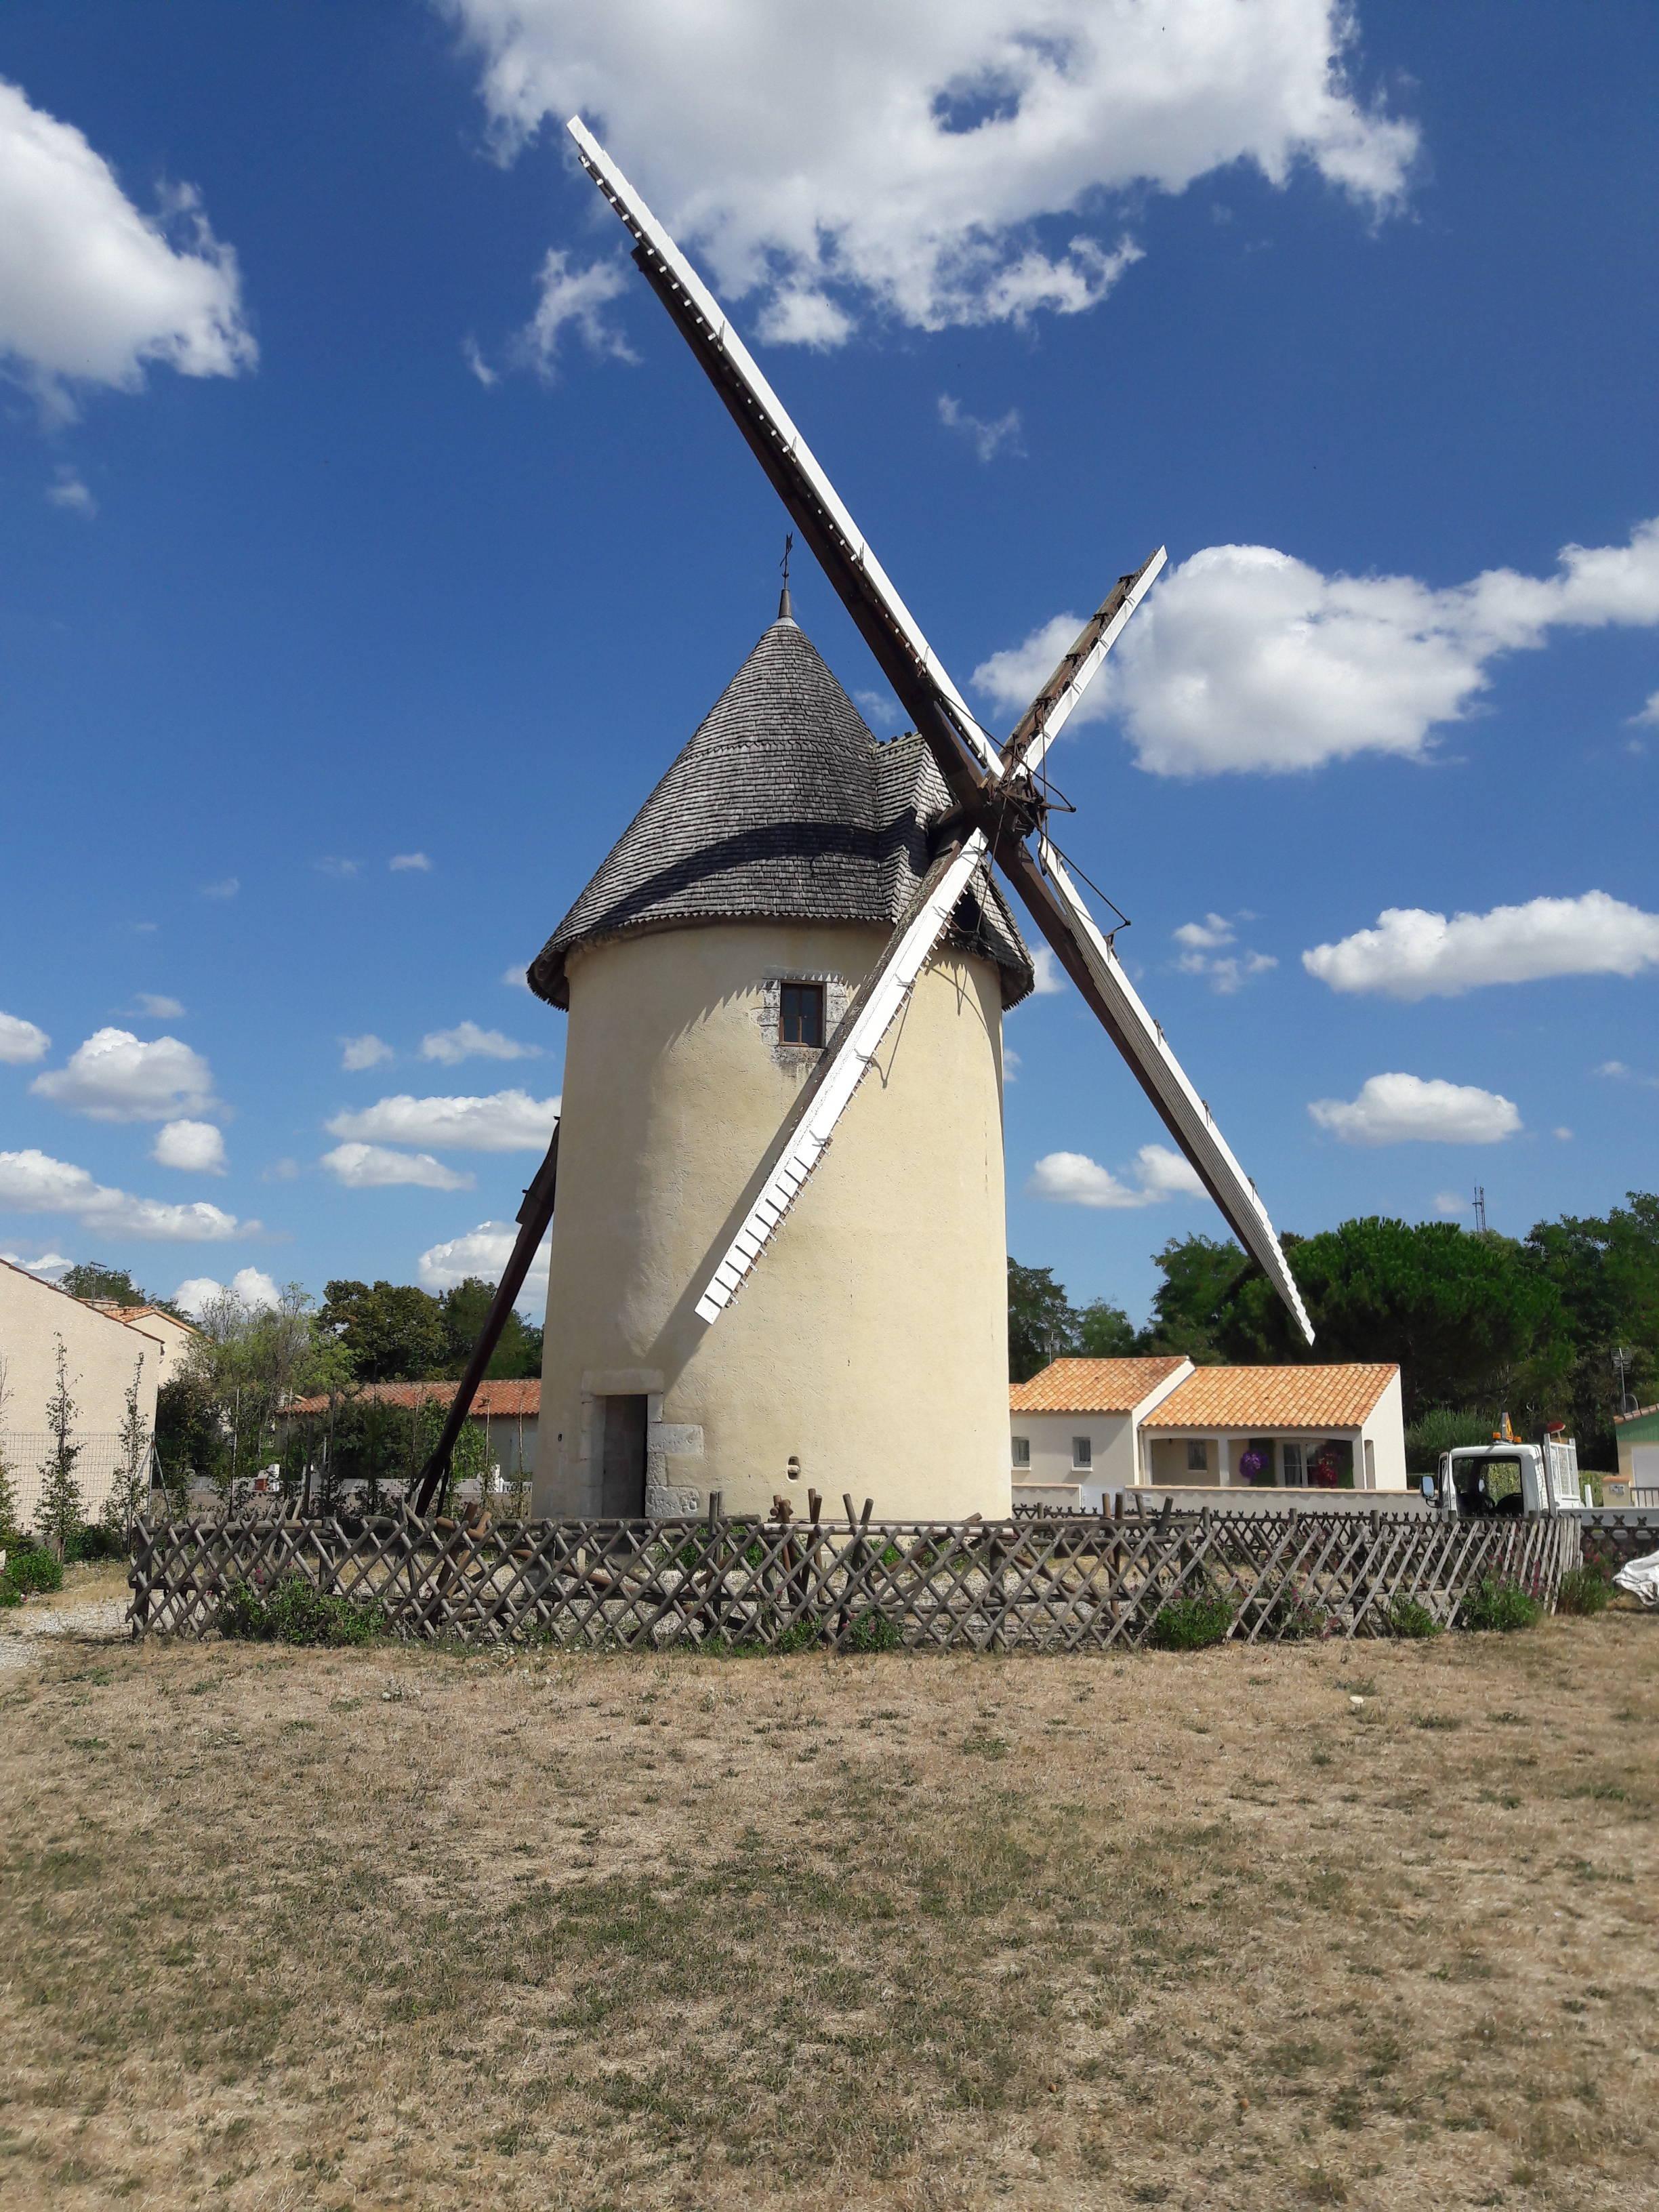 the Beauregard mill in Marans in the Marais poitevin régional nature park.